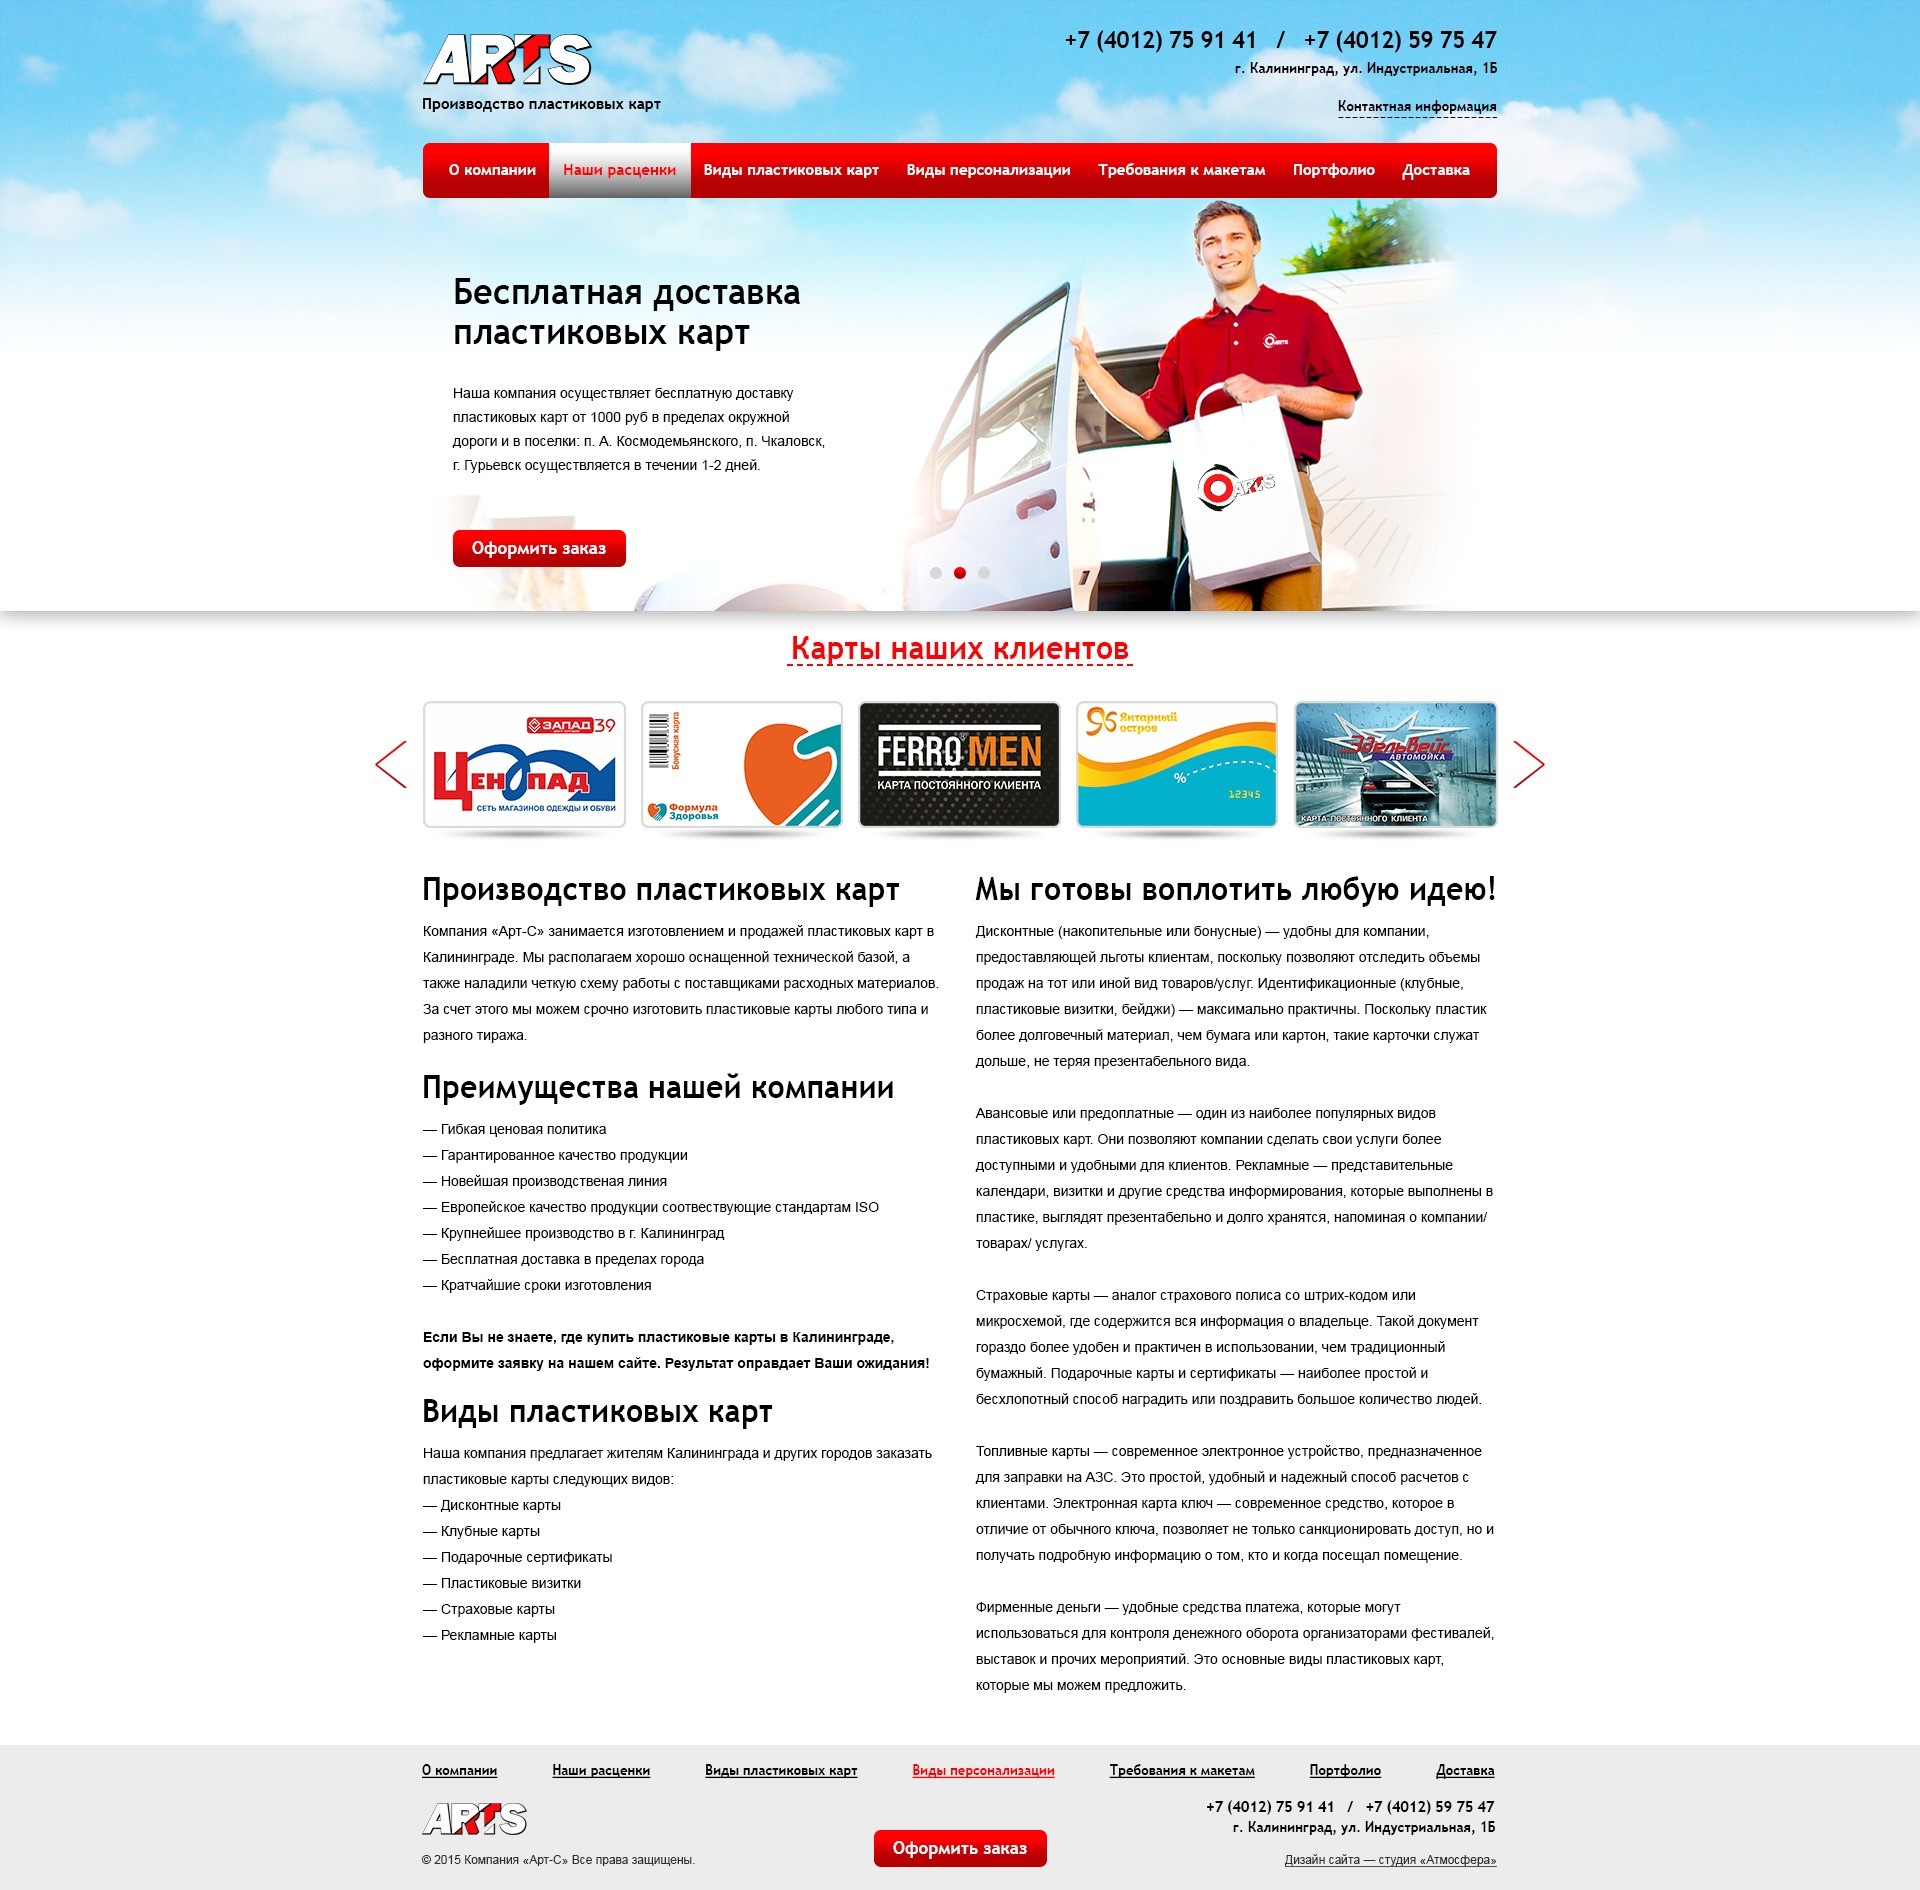 ARTS newspaper WordPress theme